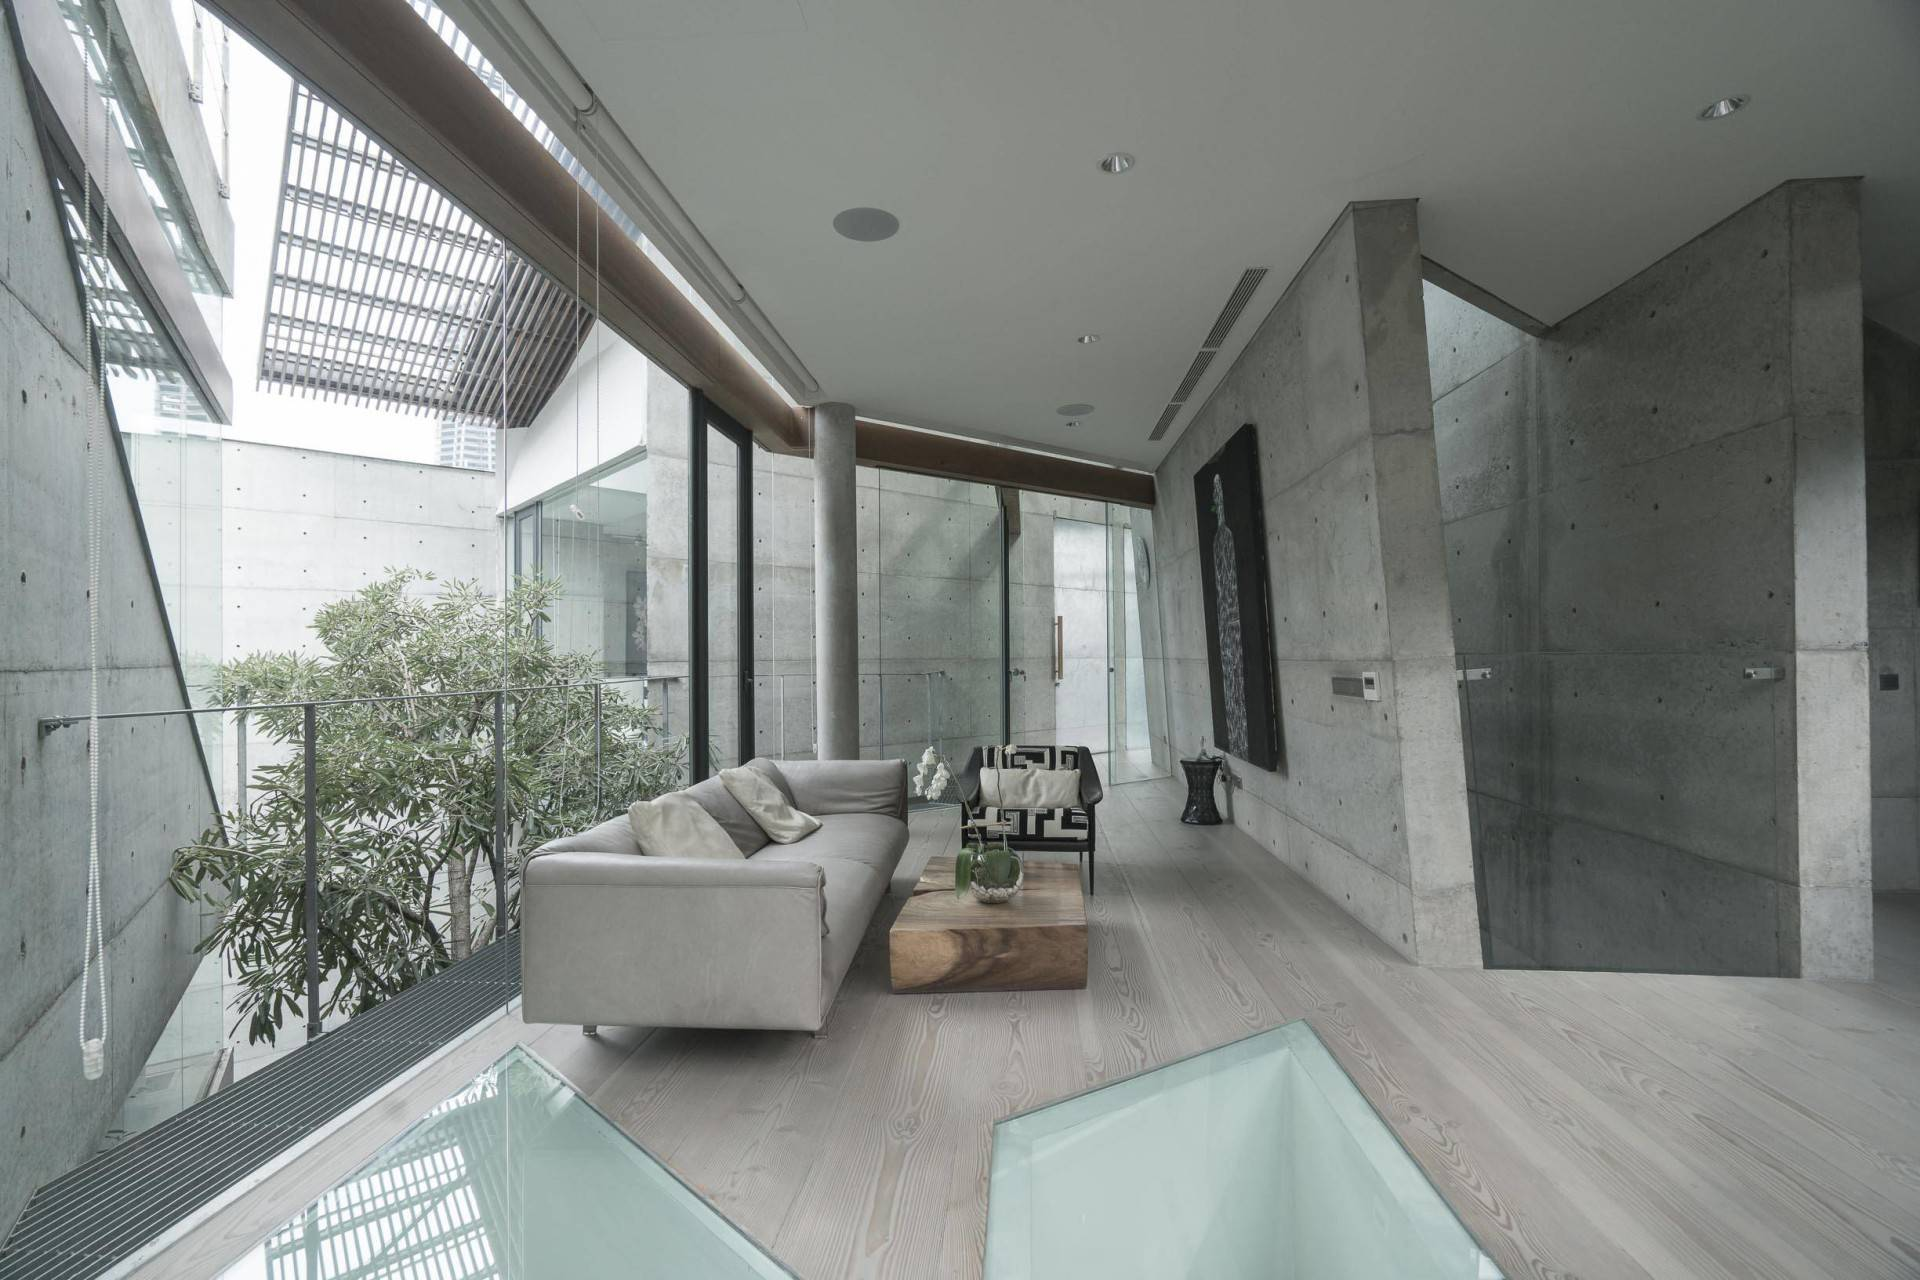 Antony Liu + Ferry Ridwan / Studio Tonton Js House Tulodong, Jakarta, Indonesia Tulodong, Jakarta, Indonesia Js House - Living Room Industrial  8127